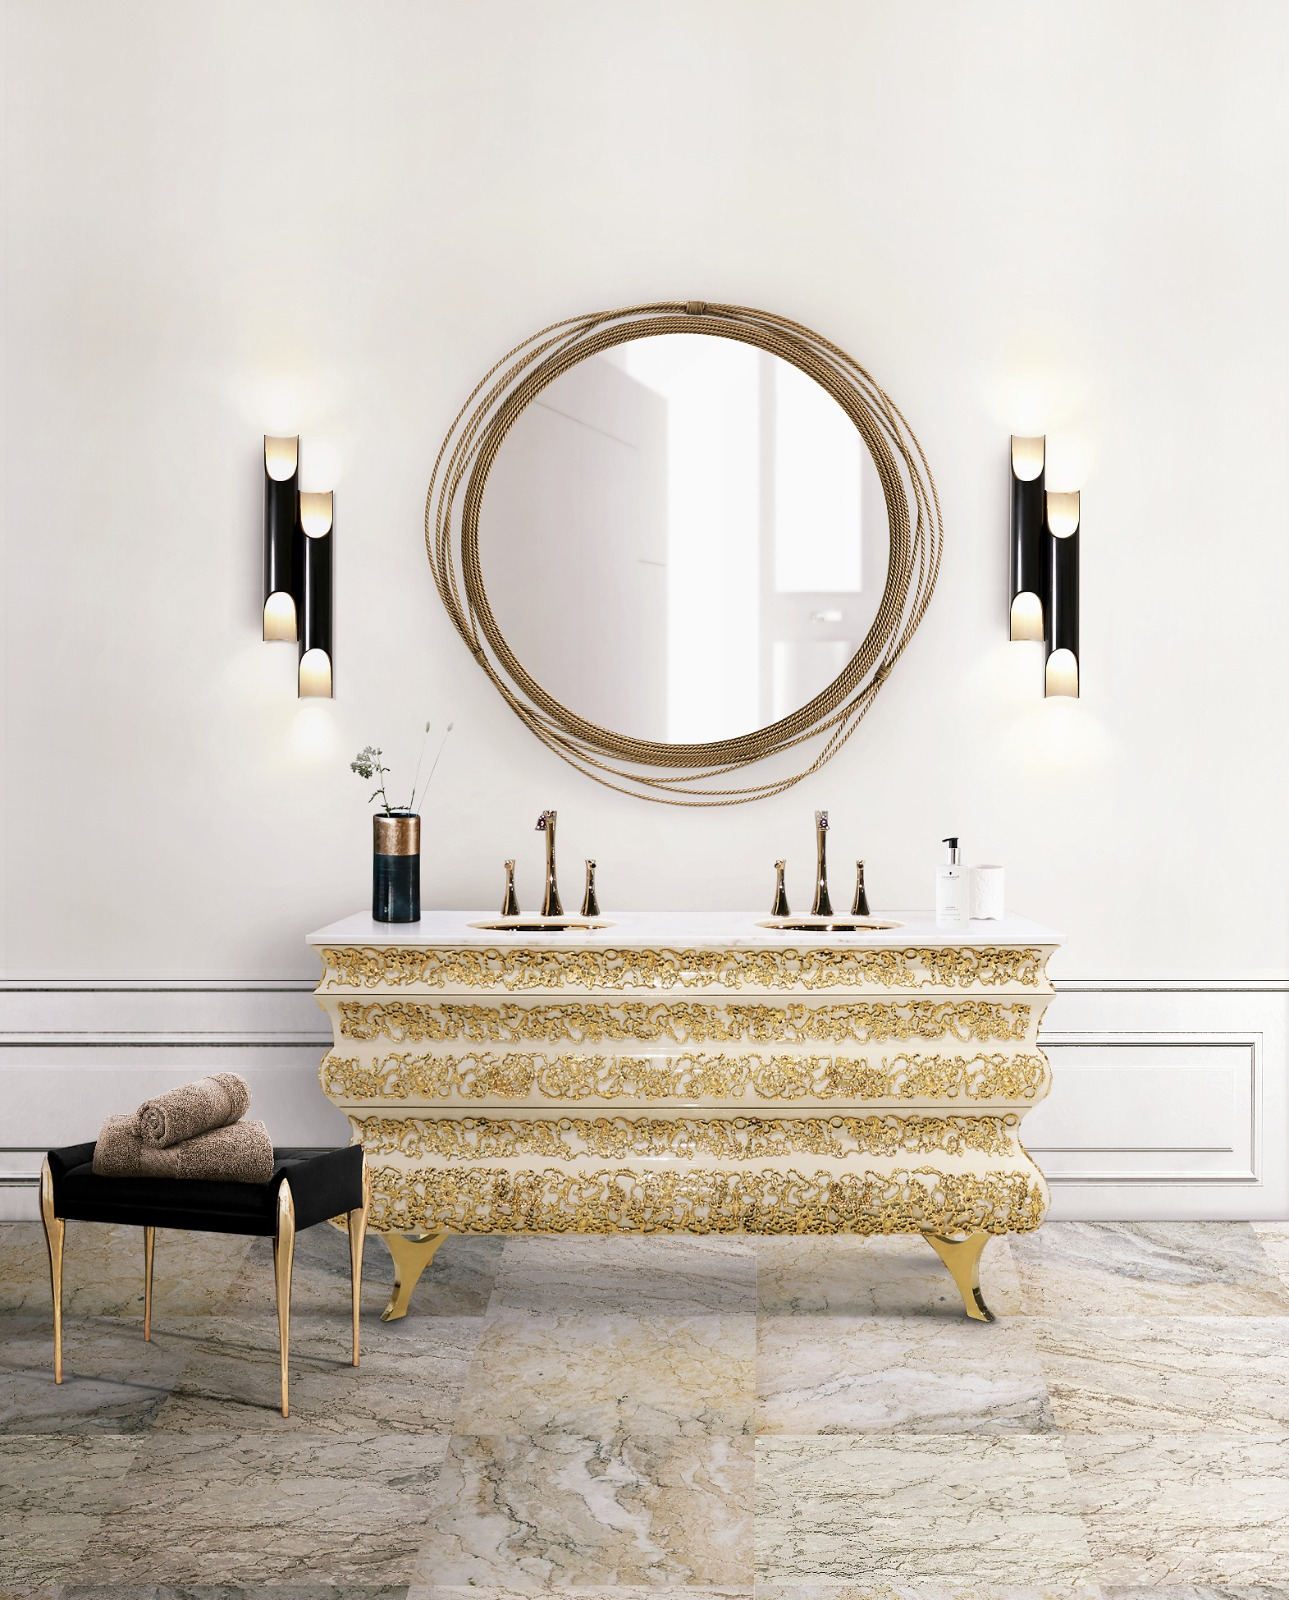 Luxury Washbasins: Products to Elevate your Bathroom Design luxury washbasins Luxury Washbasins: Products to Elevate your Bathroom Design 17 crochet washbasin galliano wall lamp maison valentina 1 HR